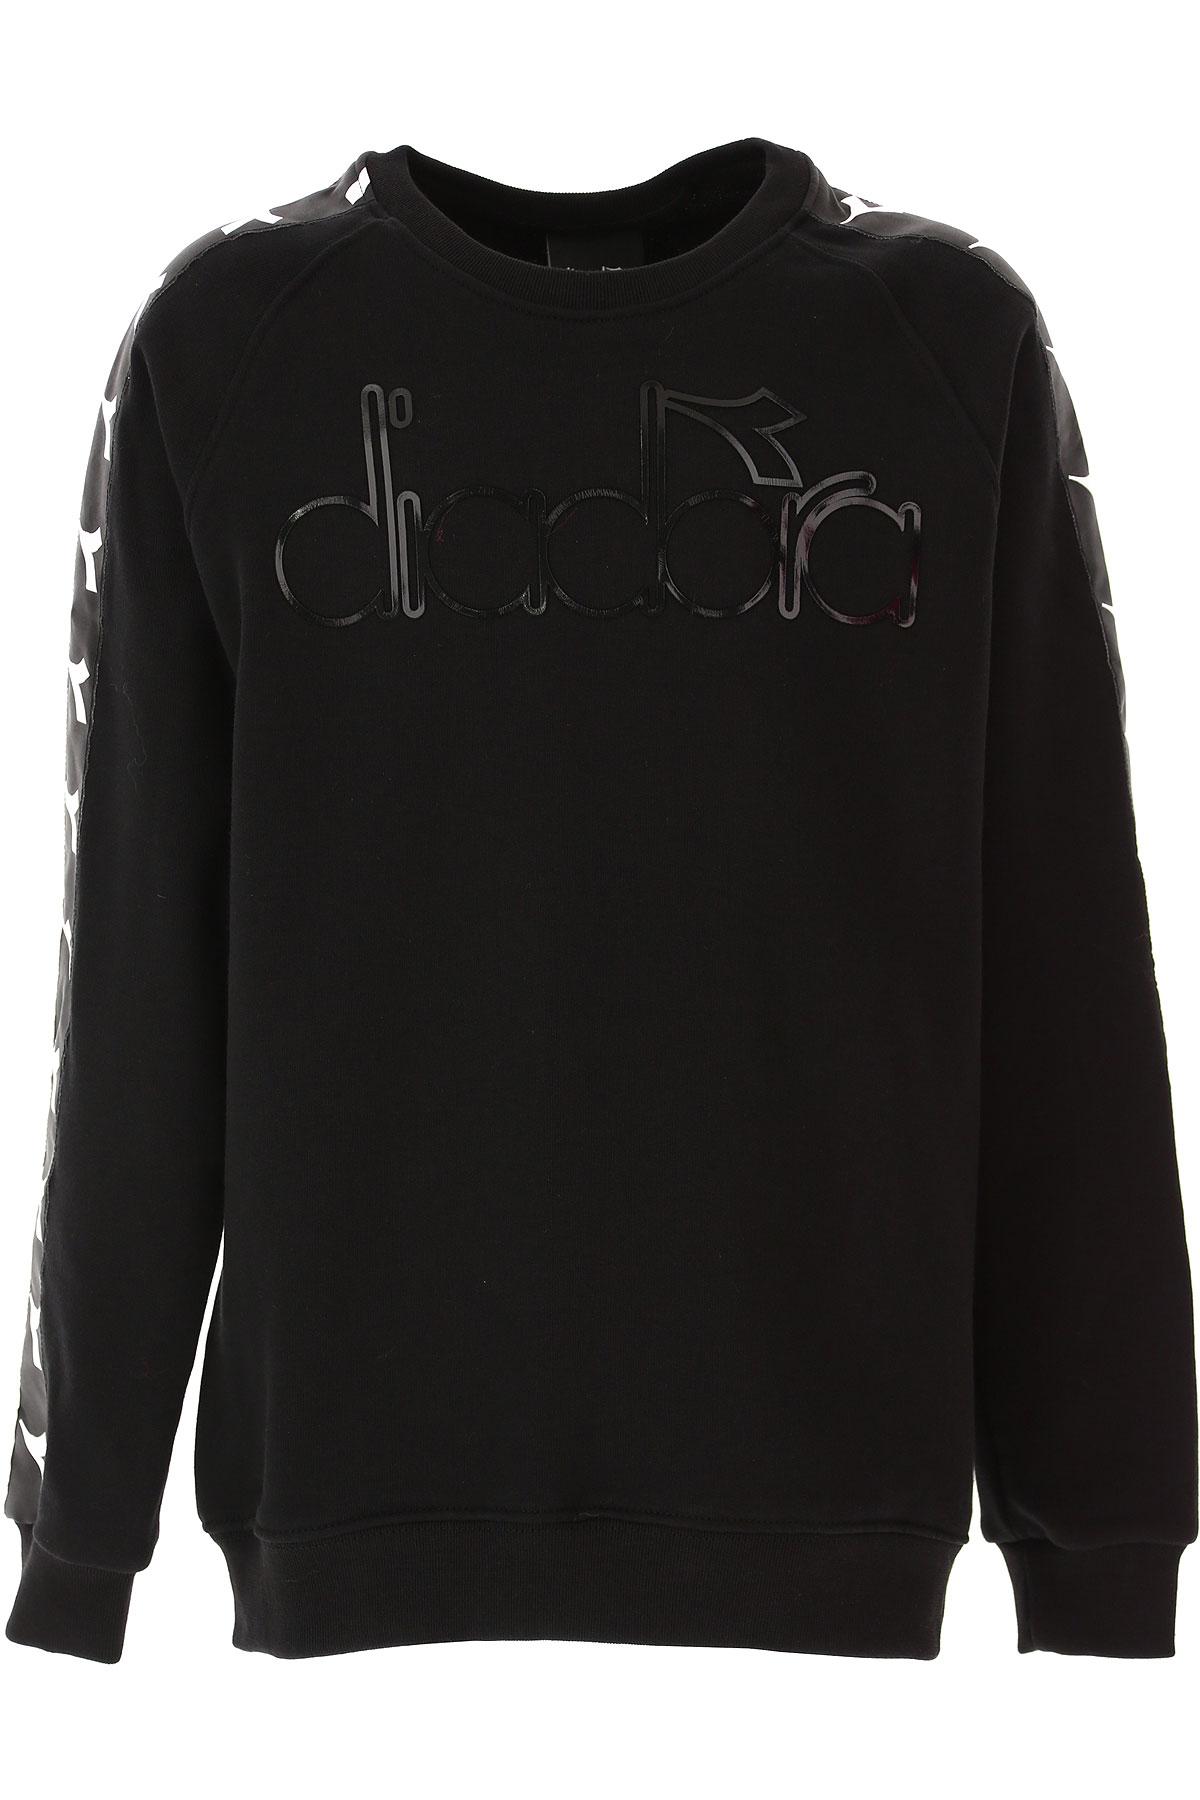 Diadora Kids Sweatshirts & Hoodies for Girls On Sale, Black, Cotton, 2019, 10Y 12Y 14Y